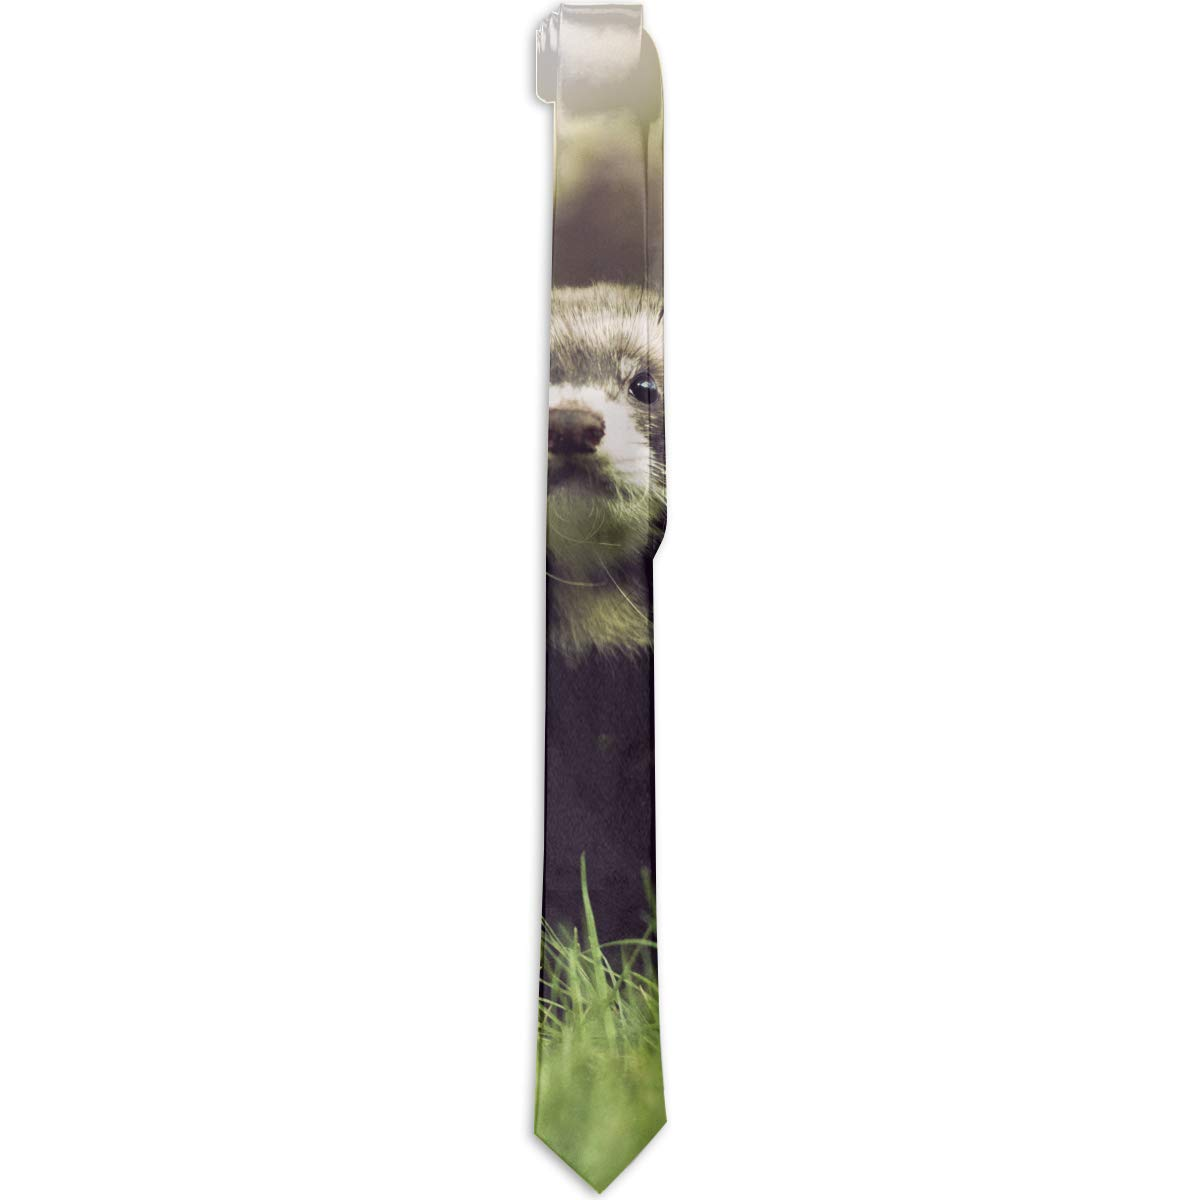 CZSJ Lovely And Cute Baby Ferrets Or Weasel In Summer Garden Mens Fashion Tie Luxury Print Necktie